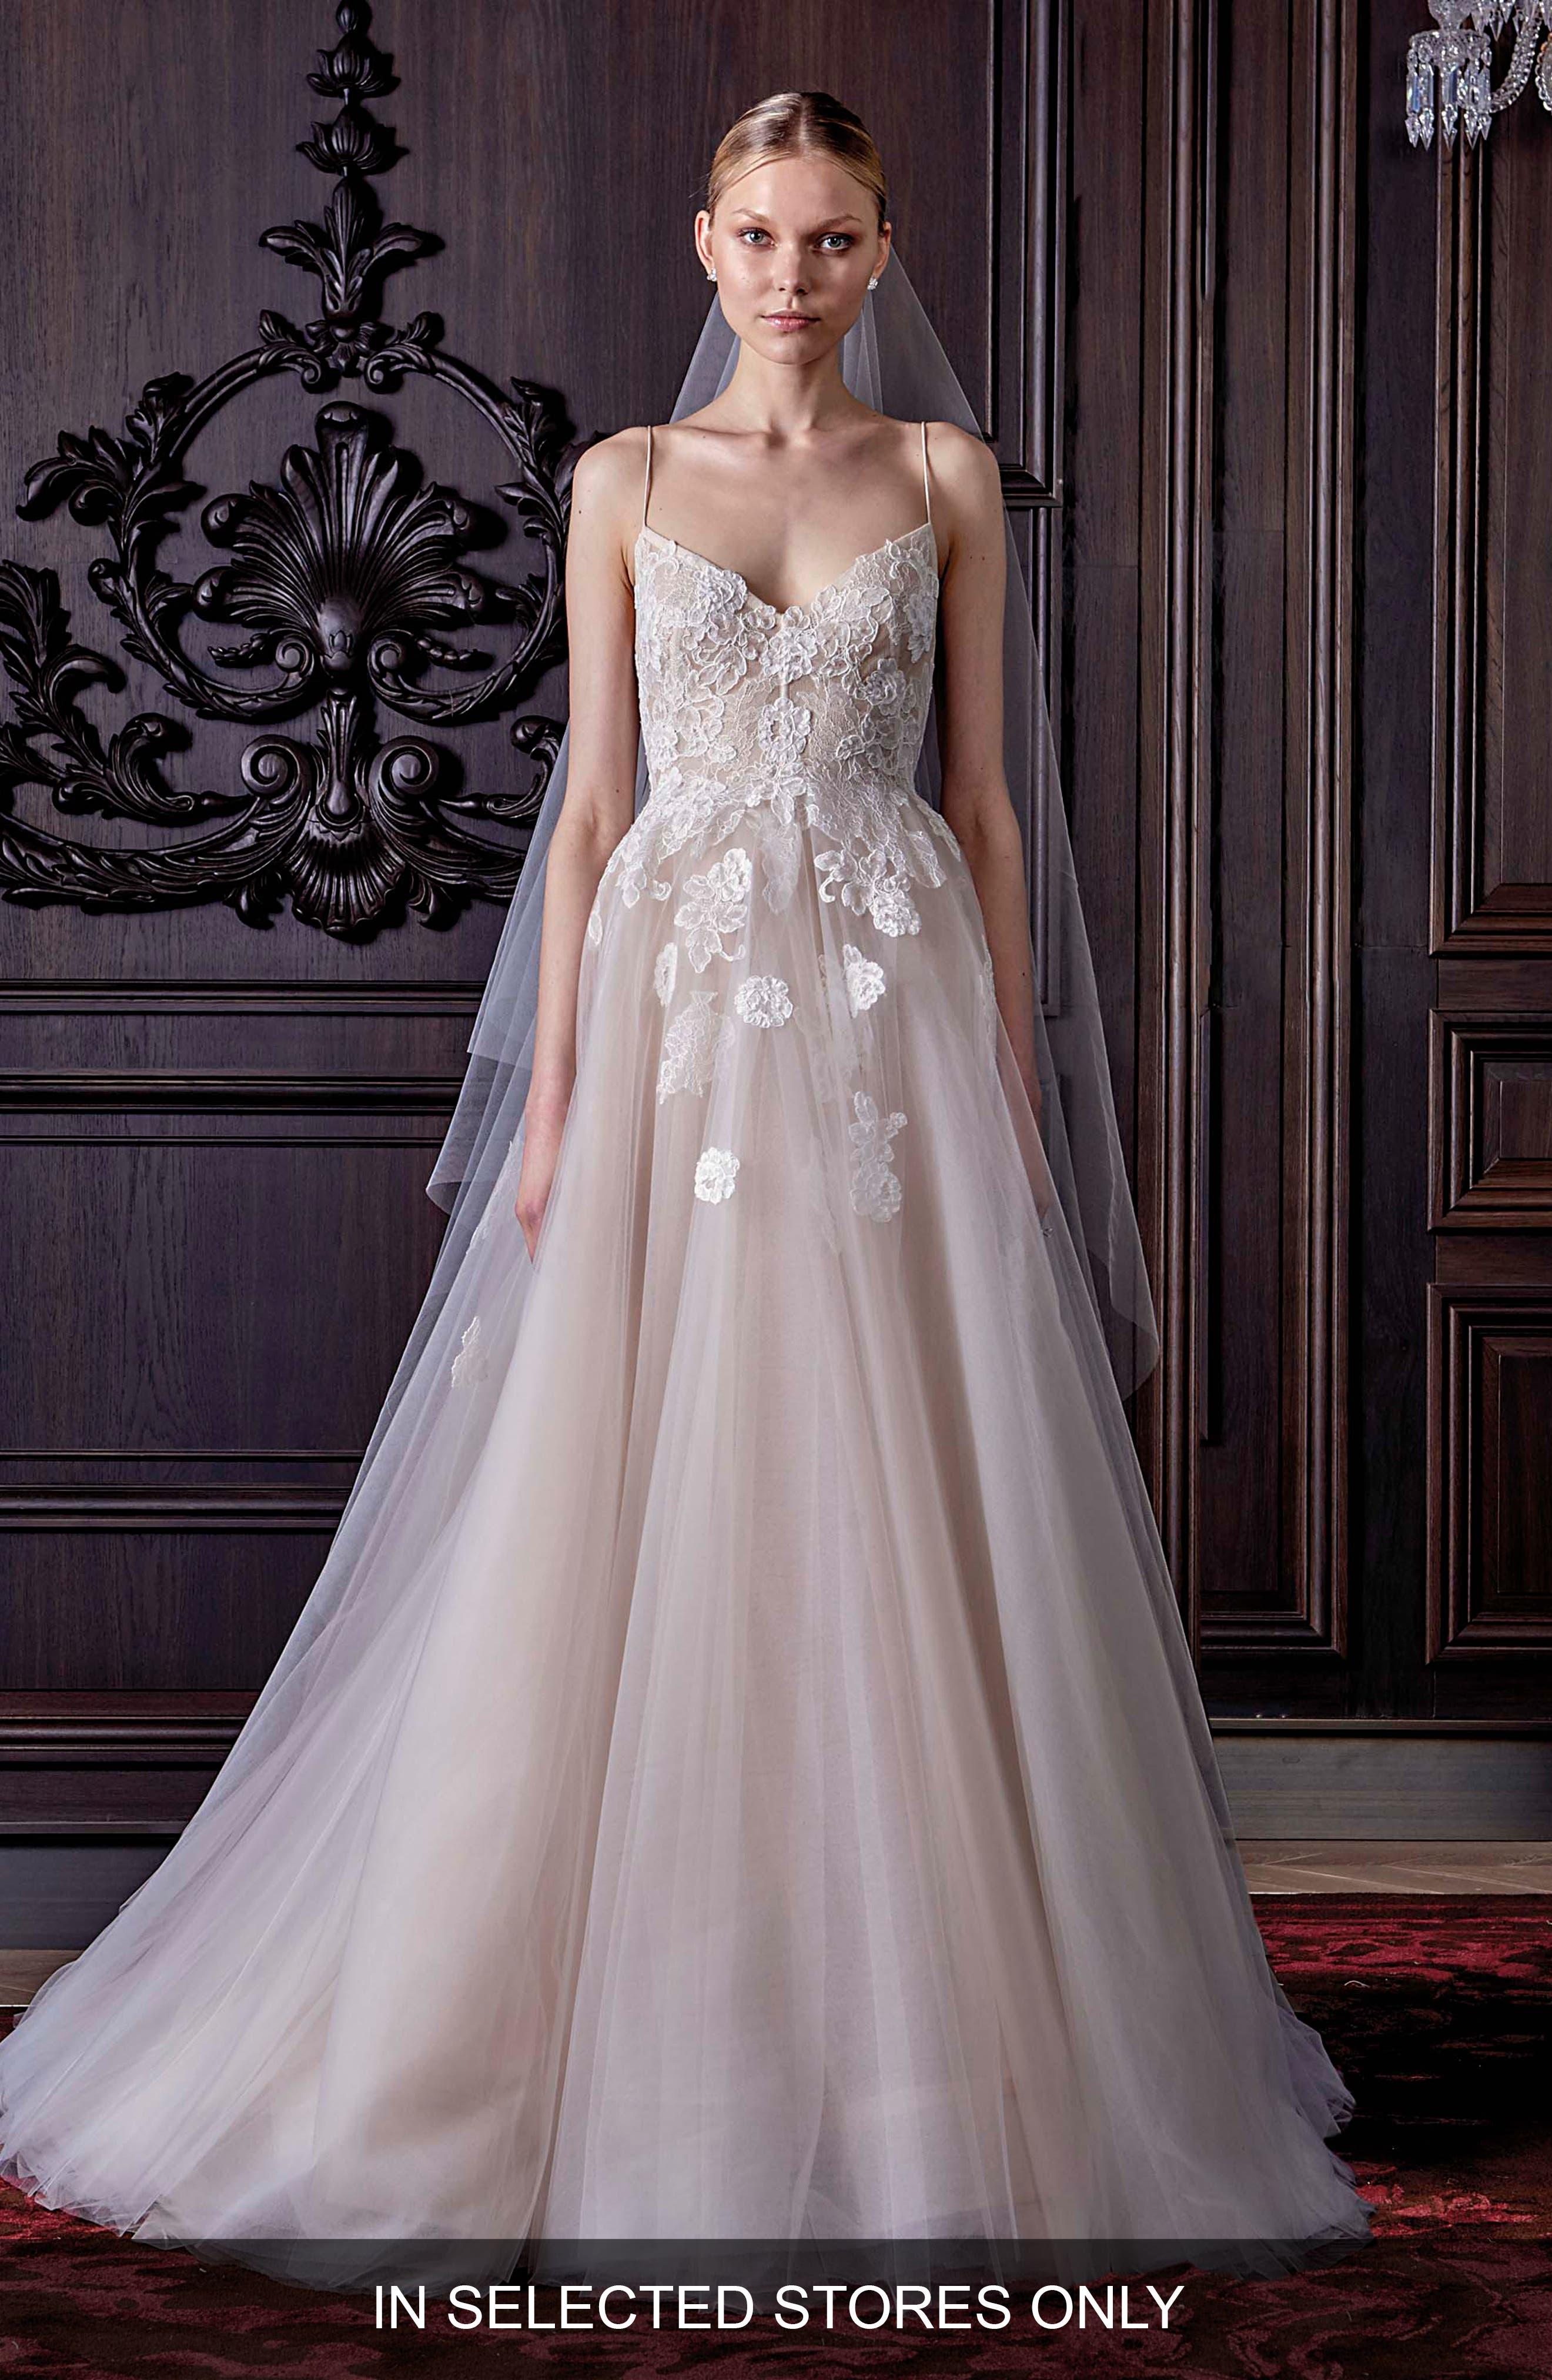 boda amy schumer Monique Lhuillier vestido de novia online